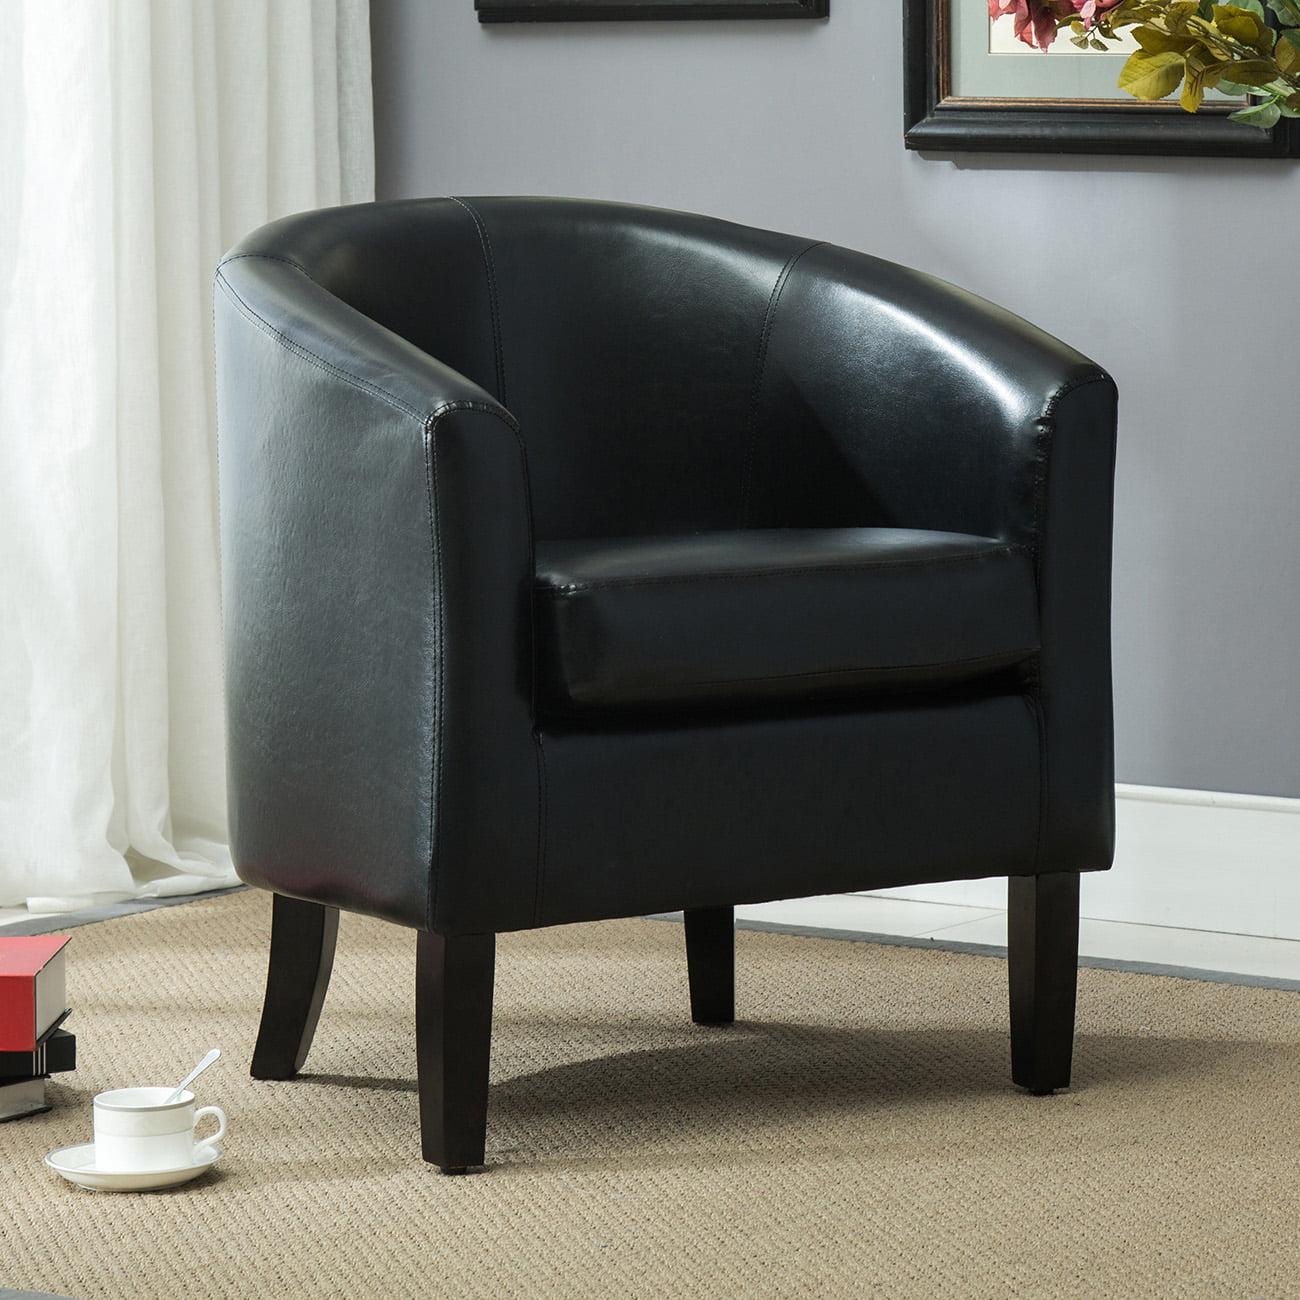 Belleze Club Chair Side Accent Elegance Faux Leather, Black by Belleze